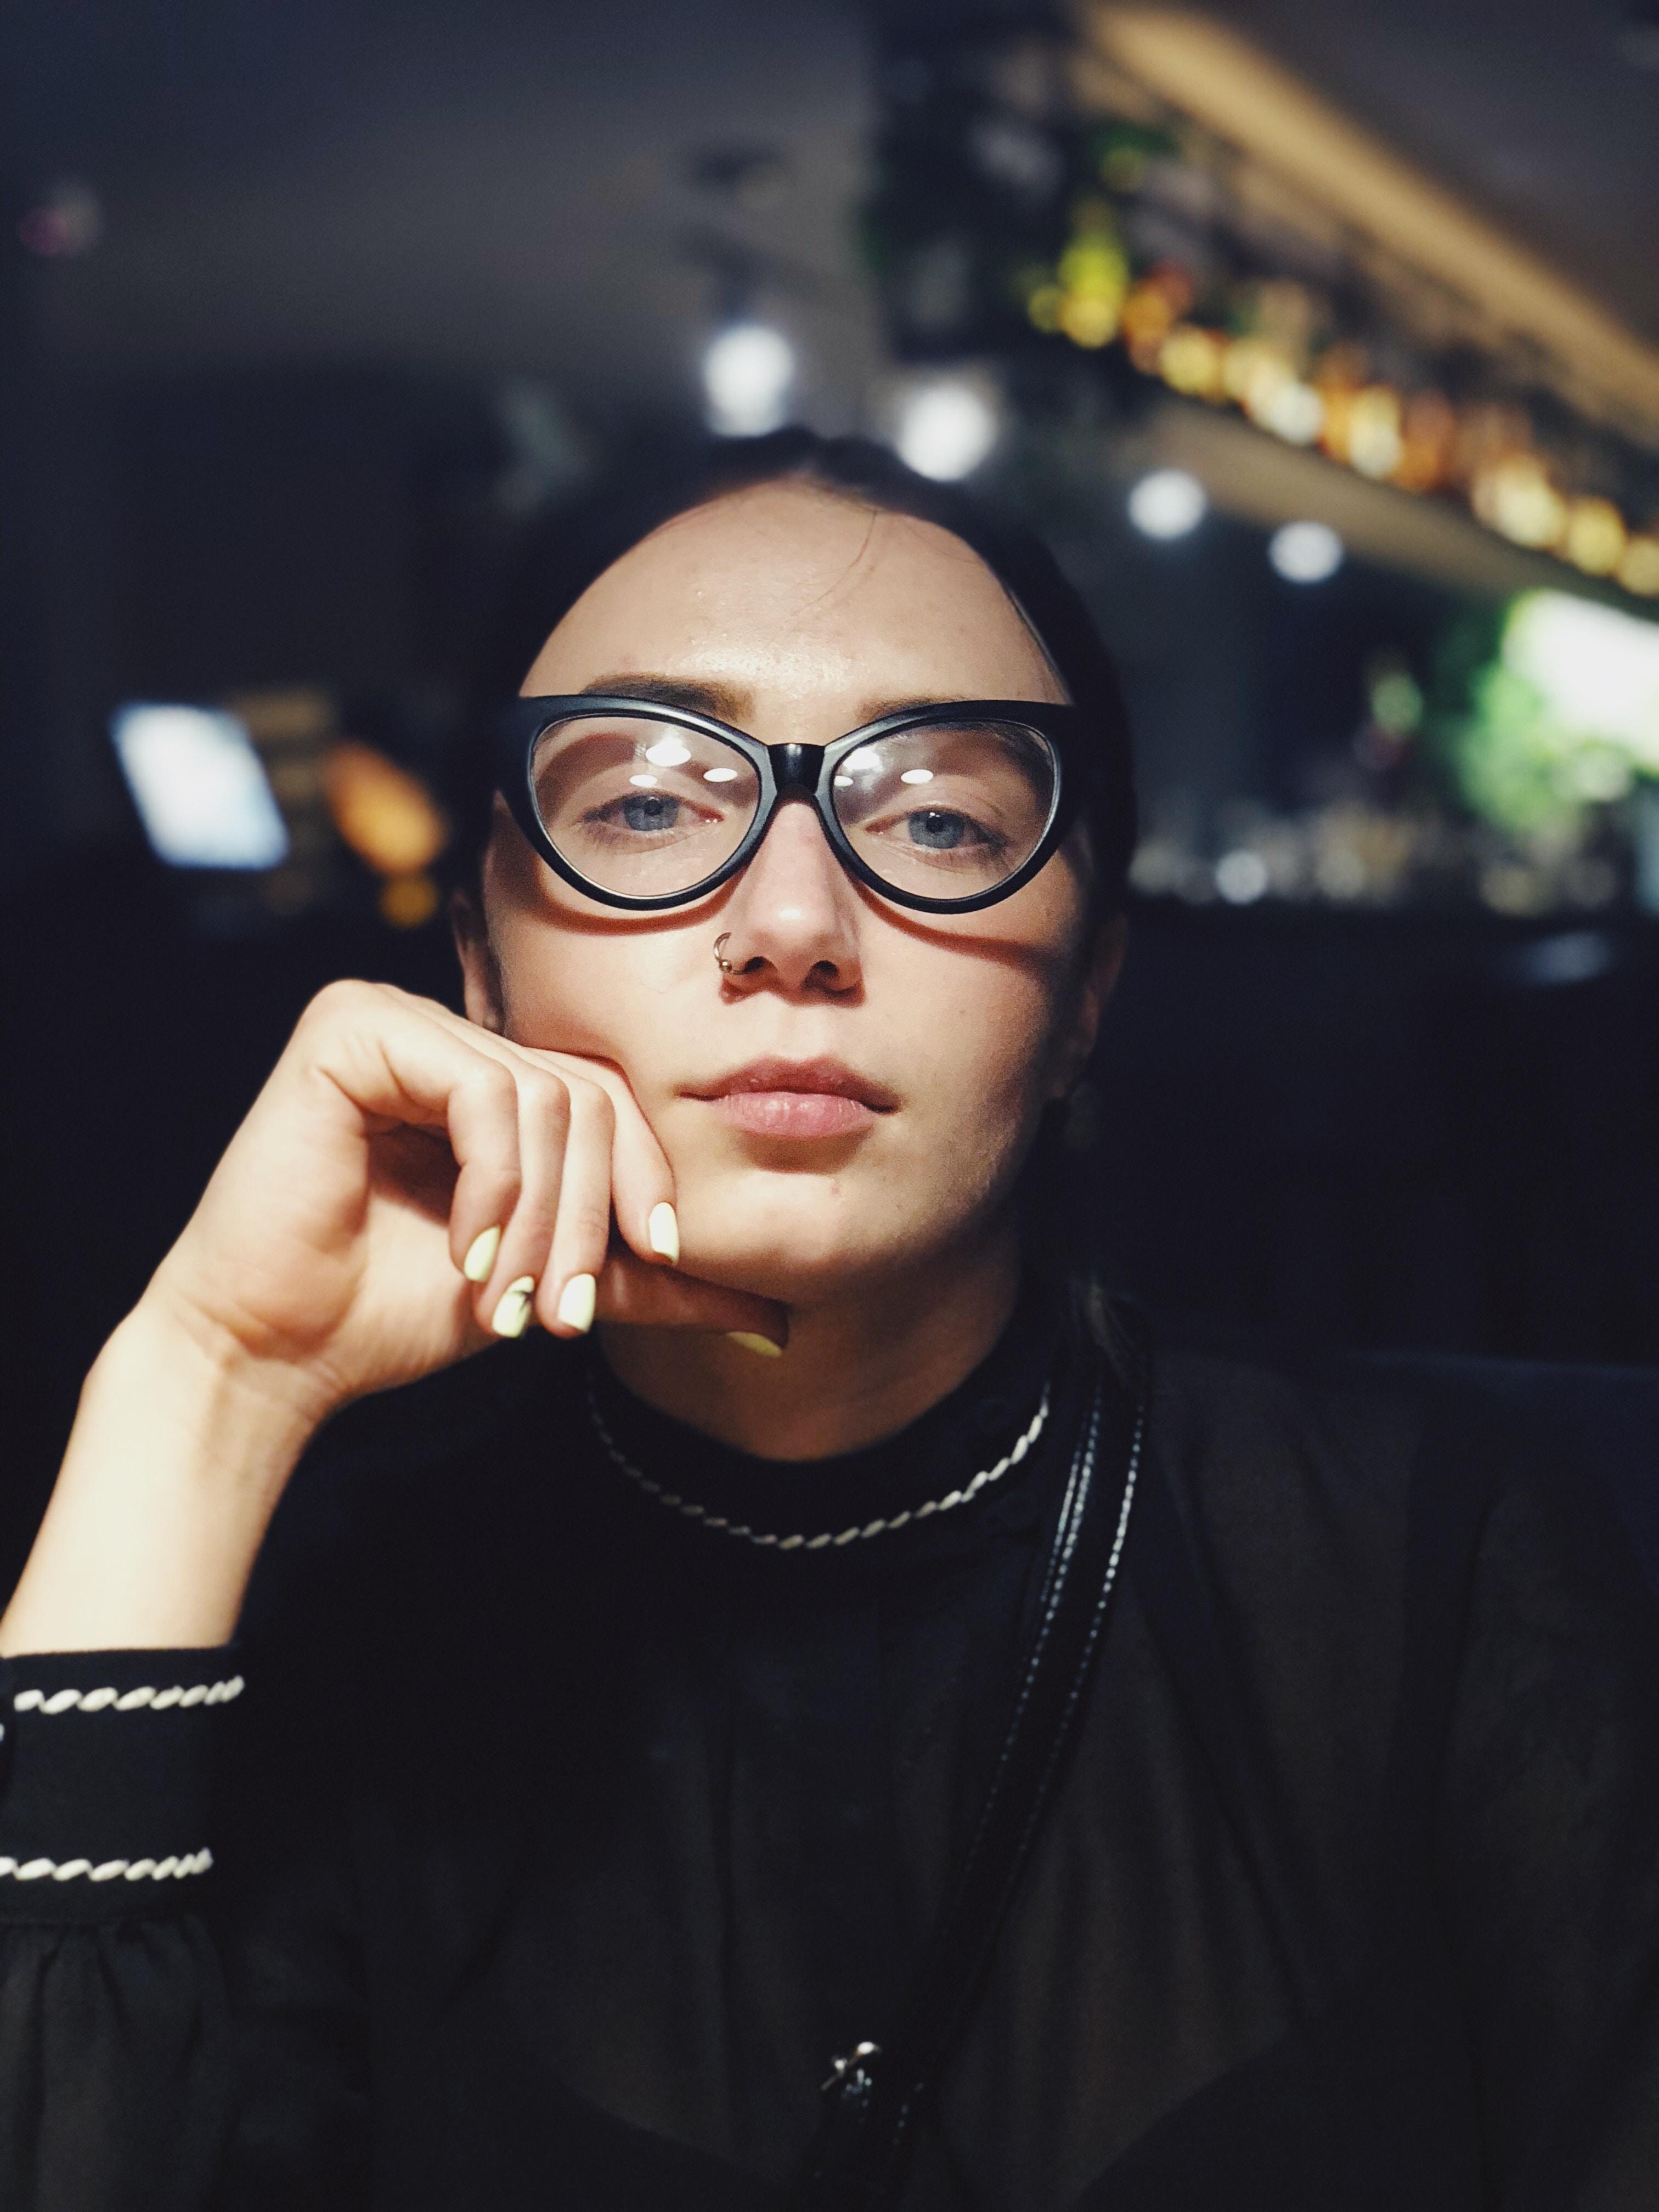 selective focus photography of woman wearing black eyeglasses